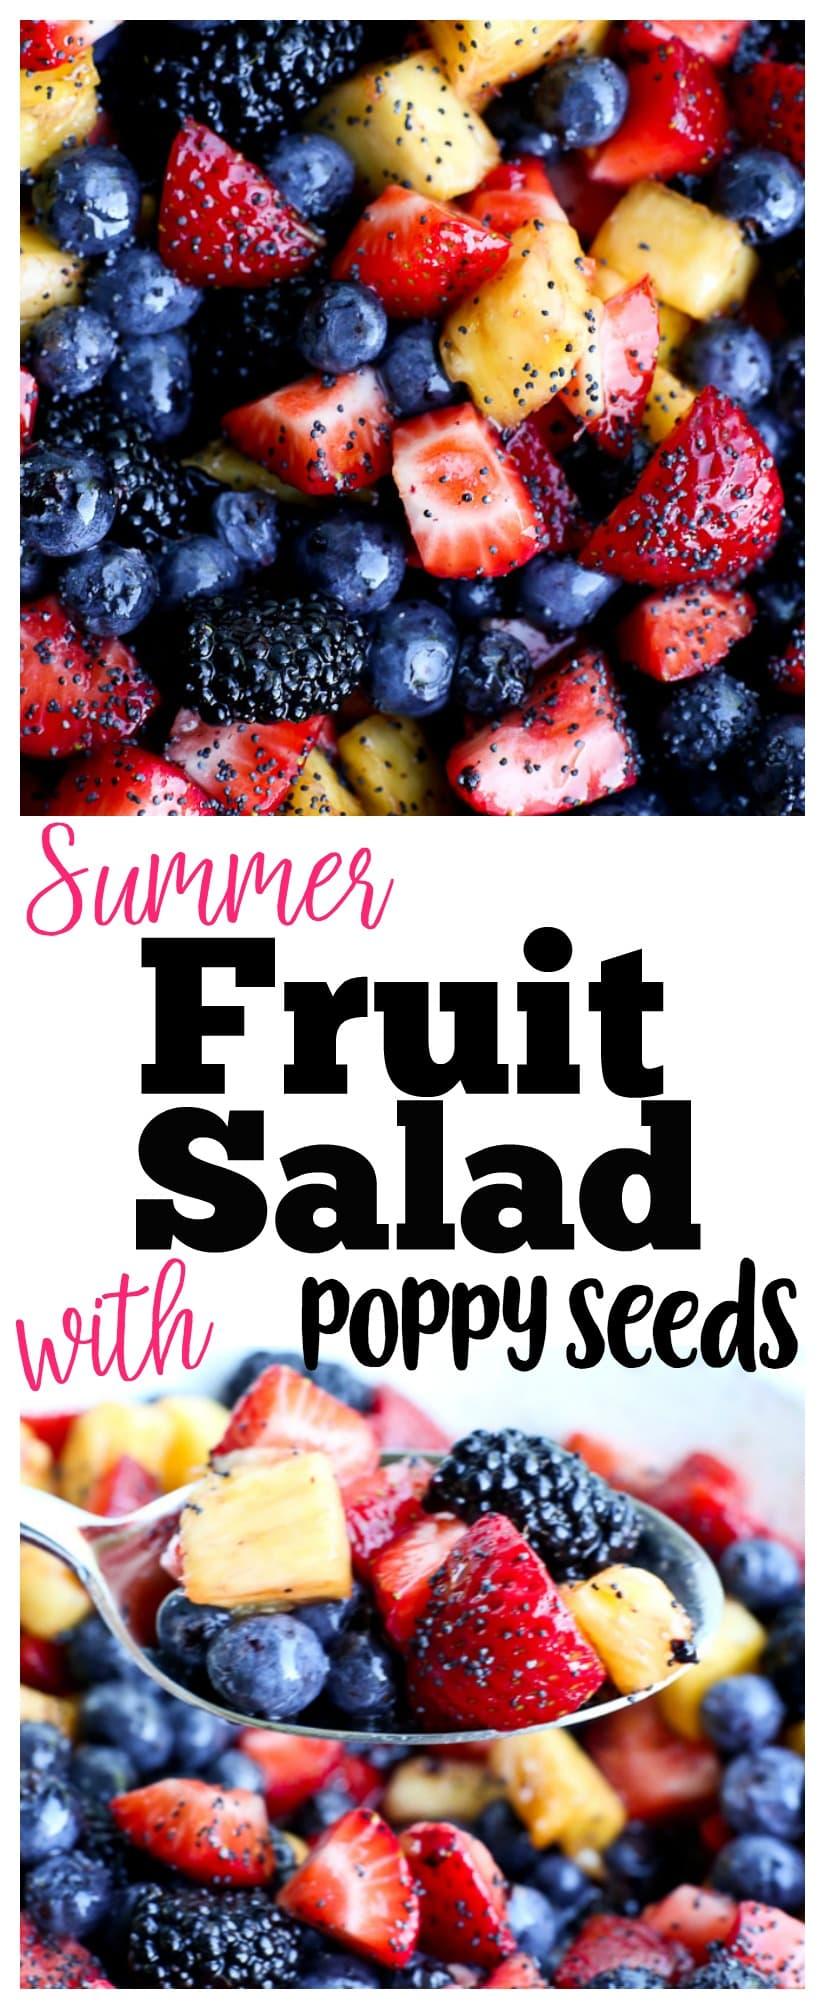 summer fruit salad recipe   poppy seeds   honey lime dressing   gluten-free   healthy recipe   pot-luck recipe